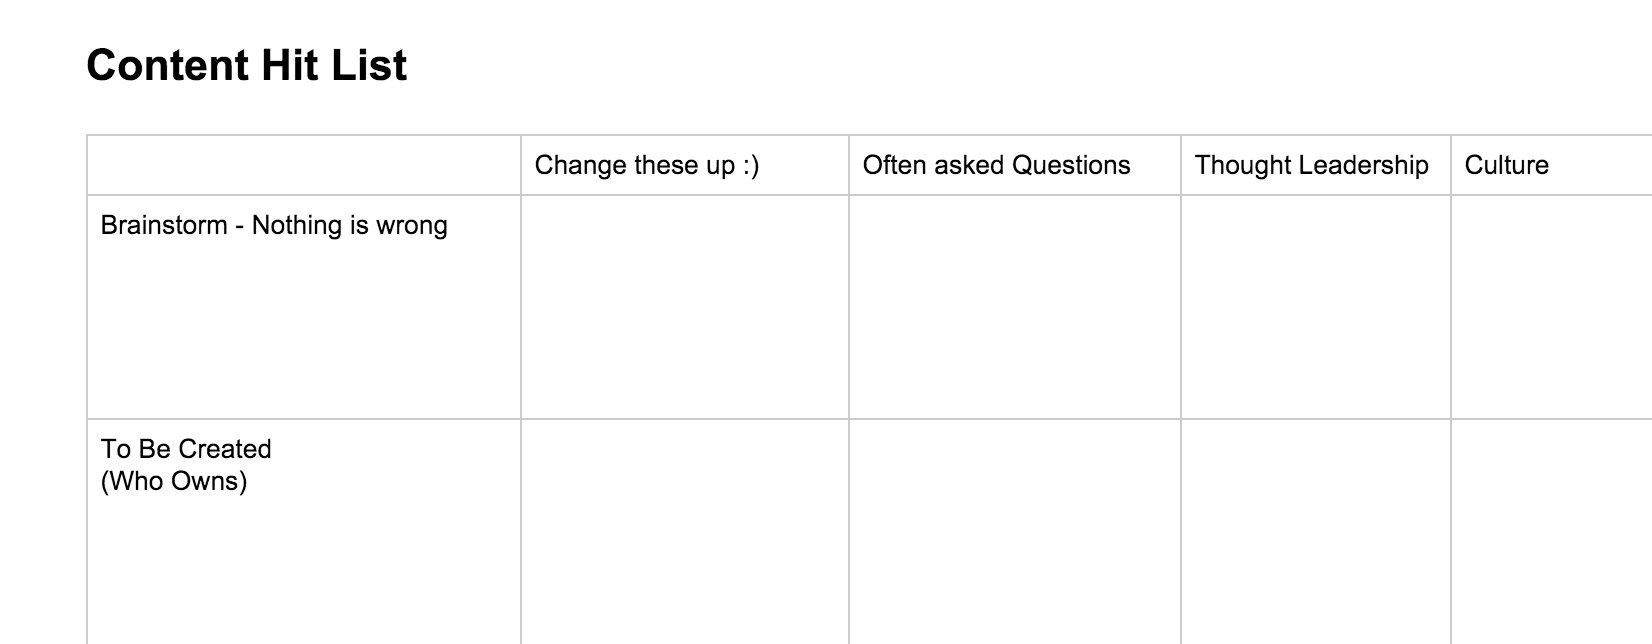 Content Hit List - Content Calendar tools and templates